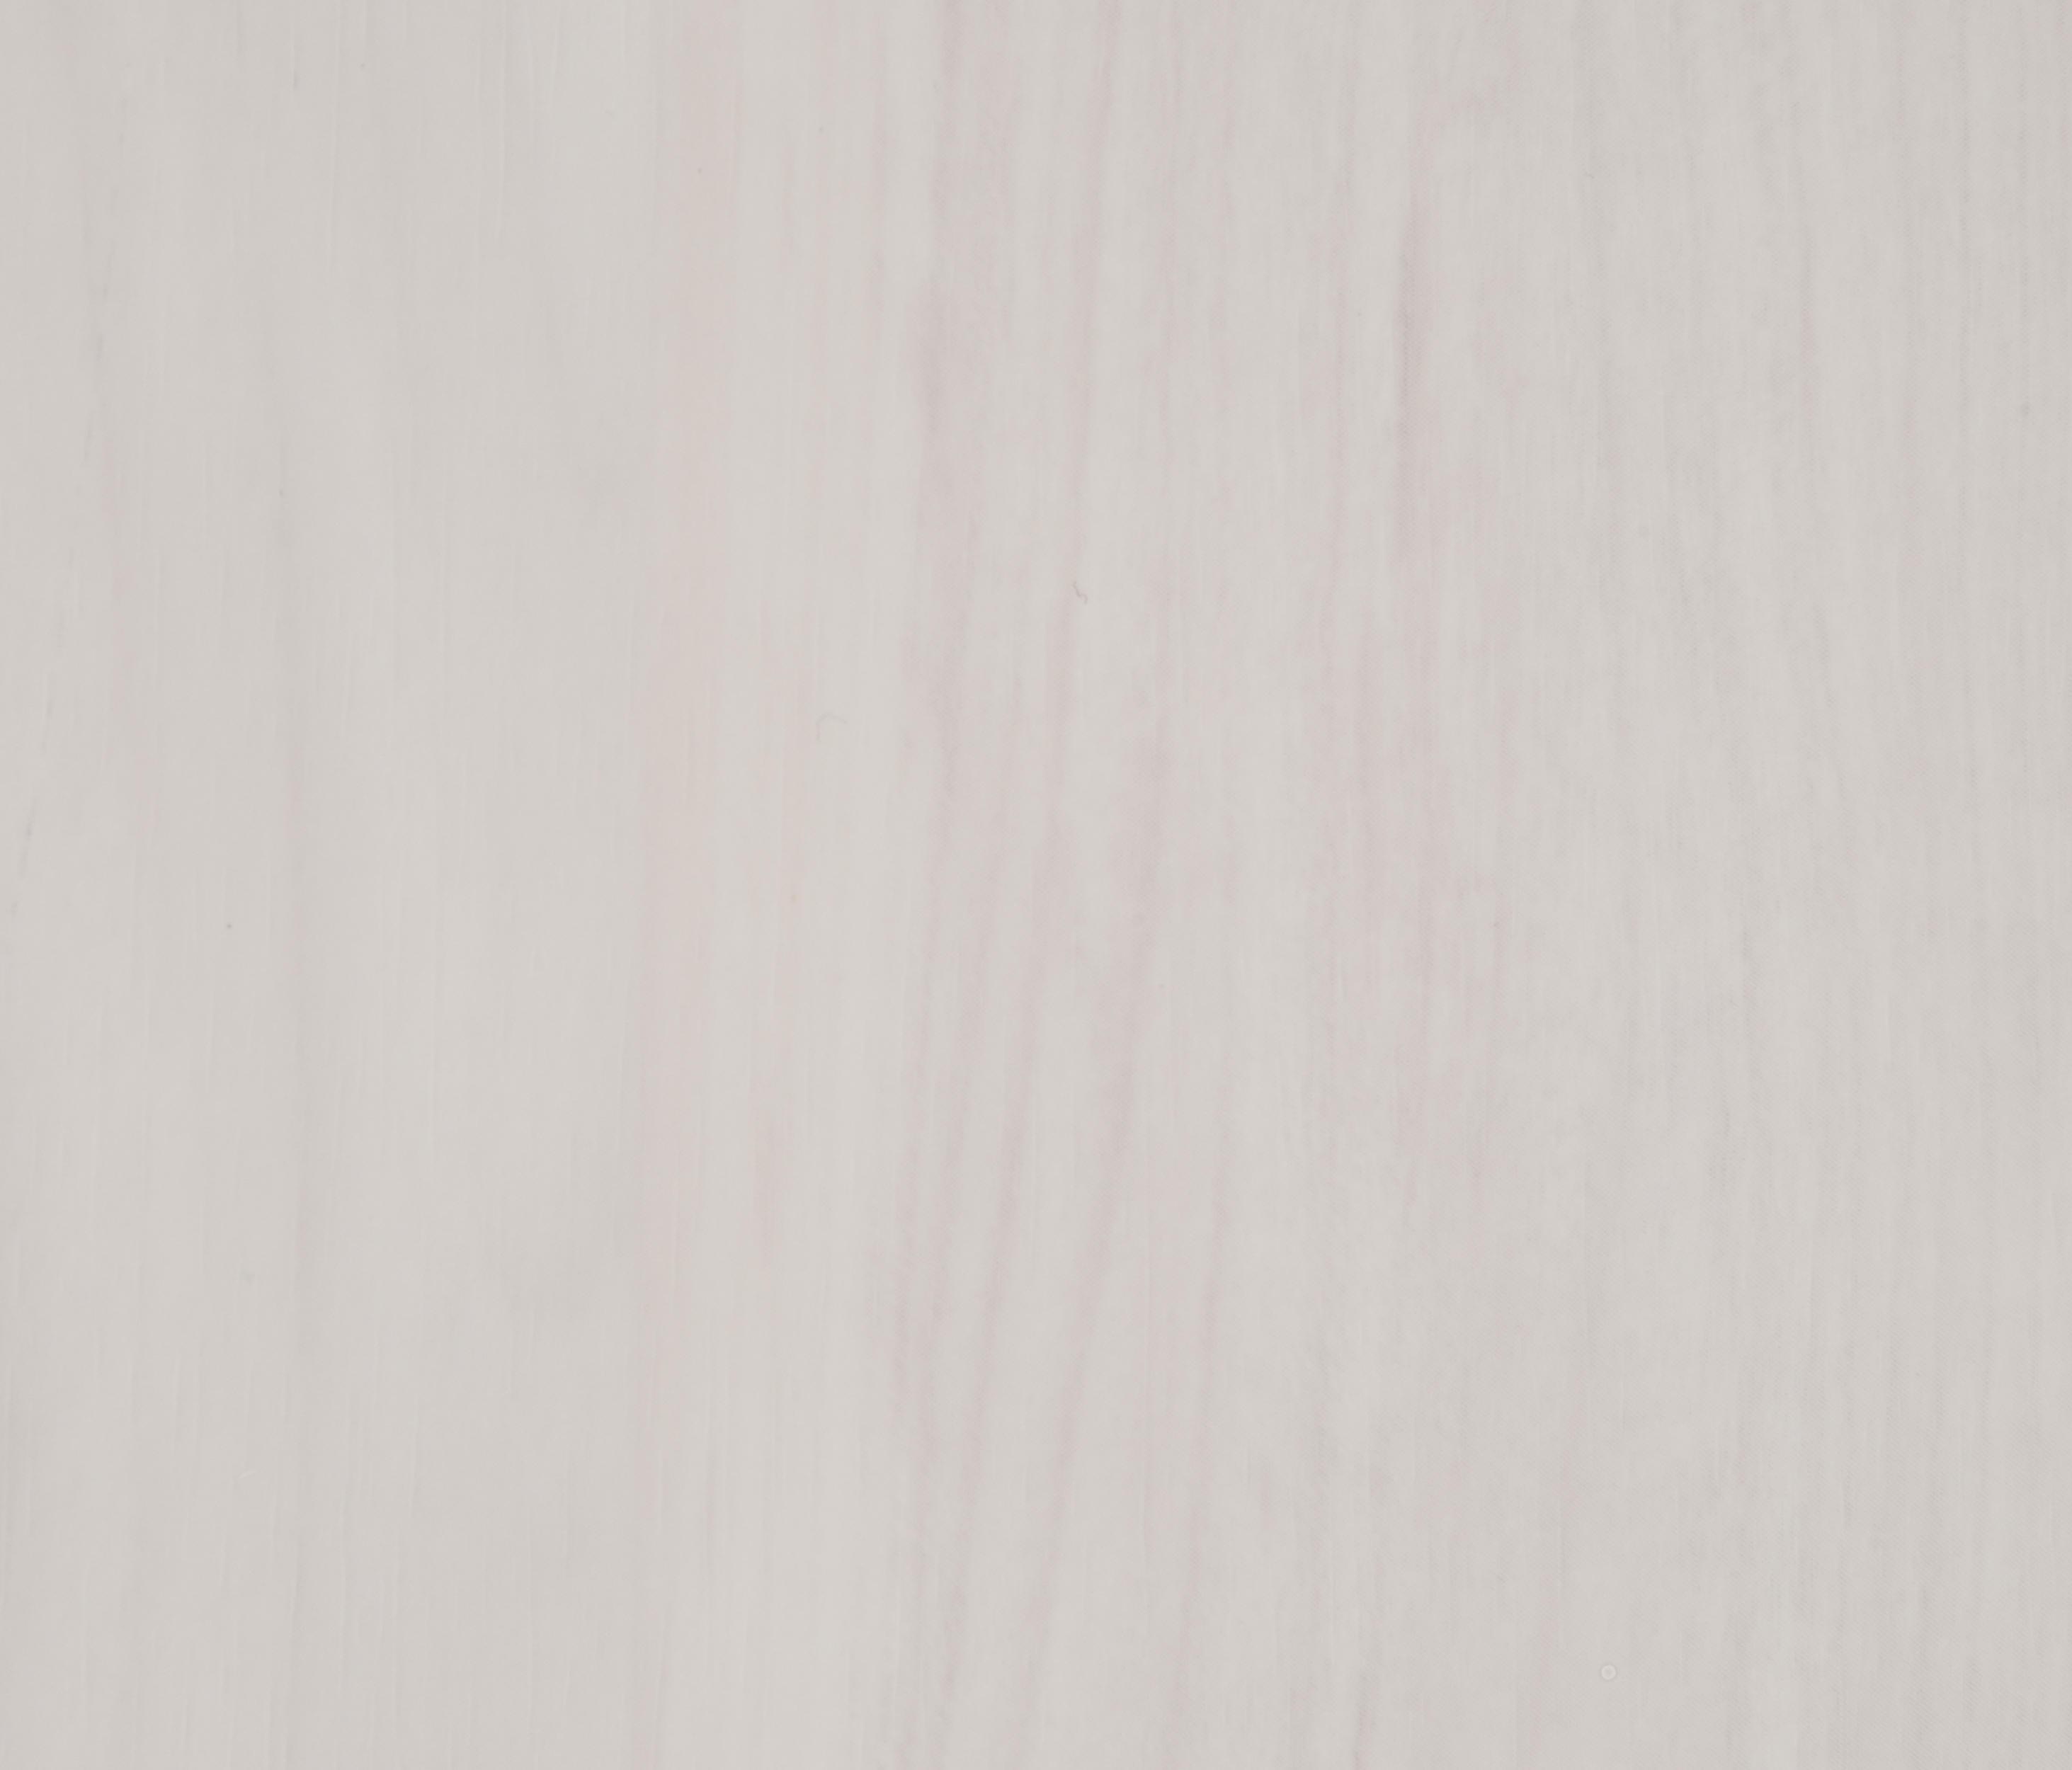 3m di noc architectural finish wg 1067 wood grain for Laminas adhesivas pared